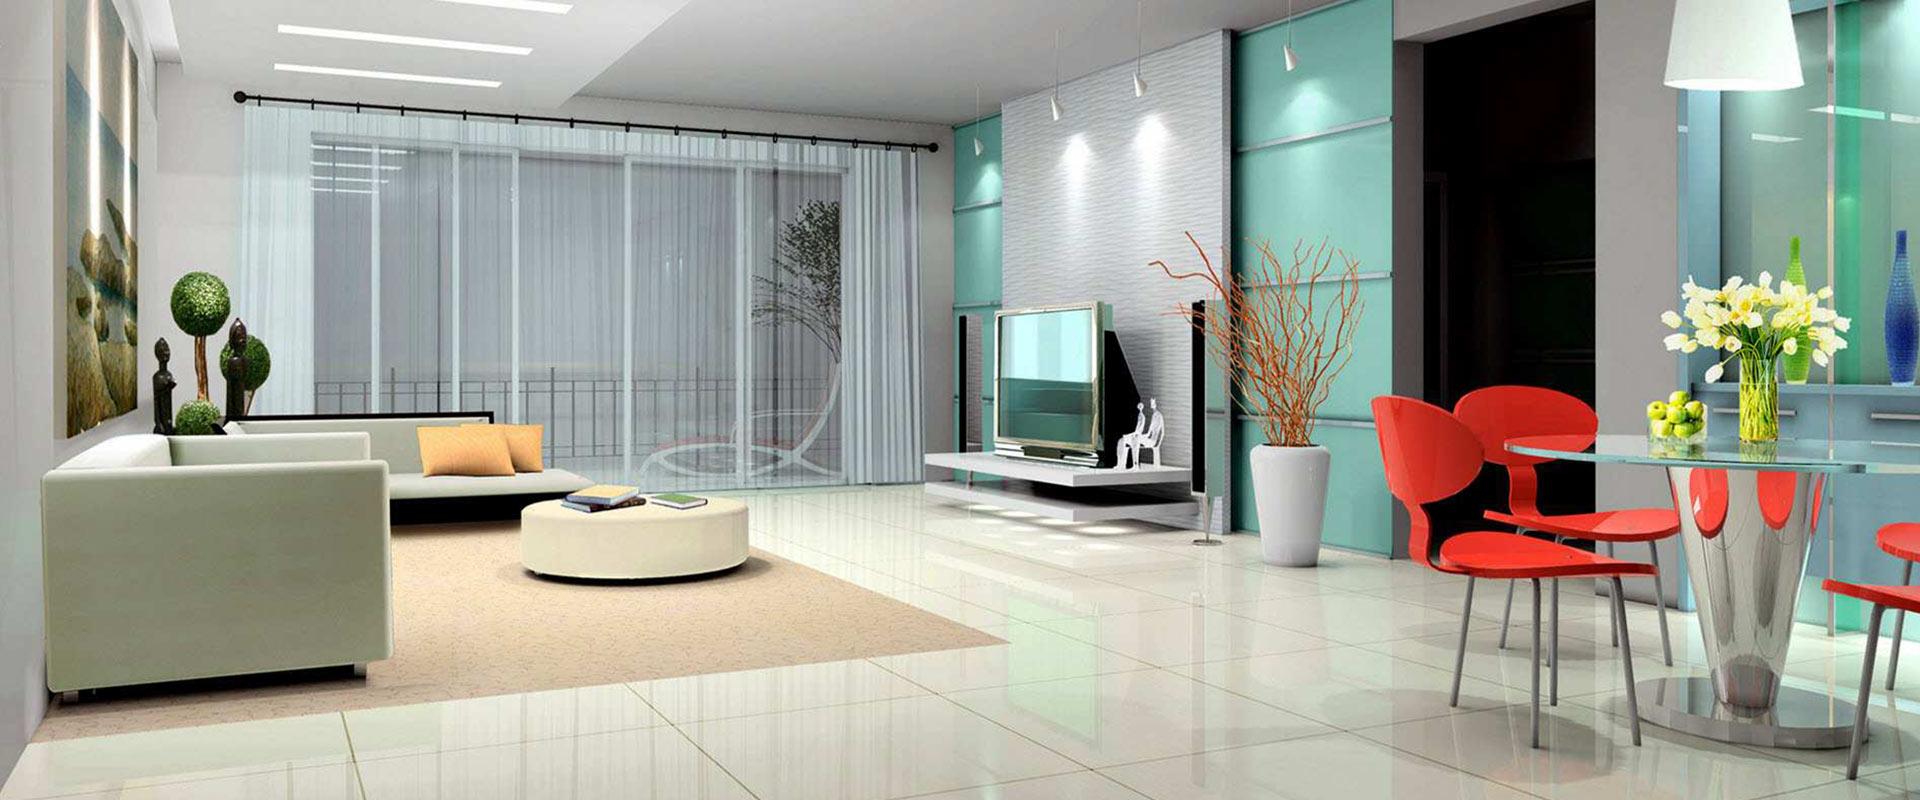 Home Interior Design Themes | Beinterior Betheme